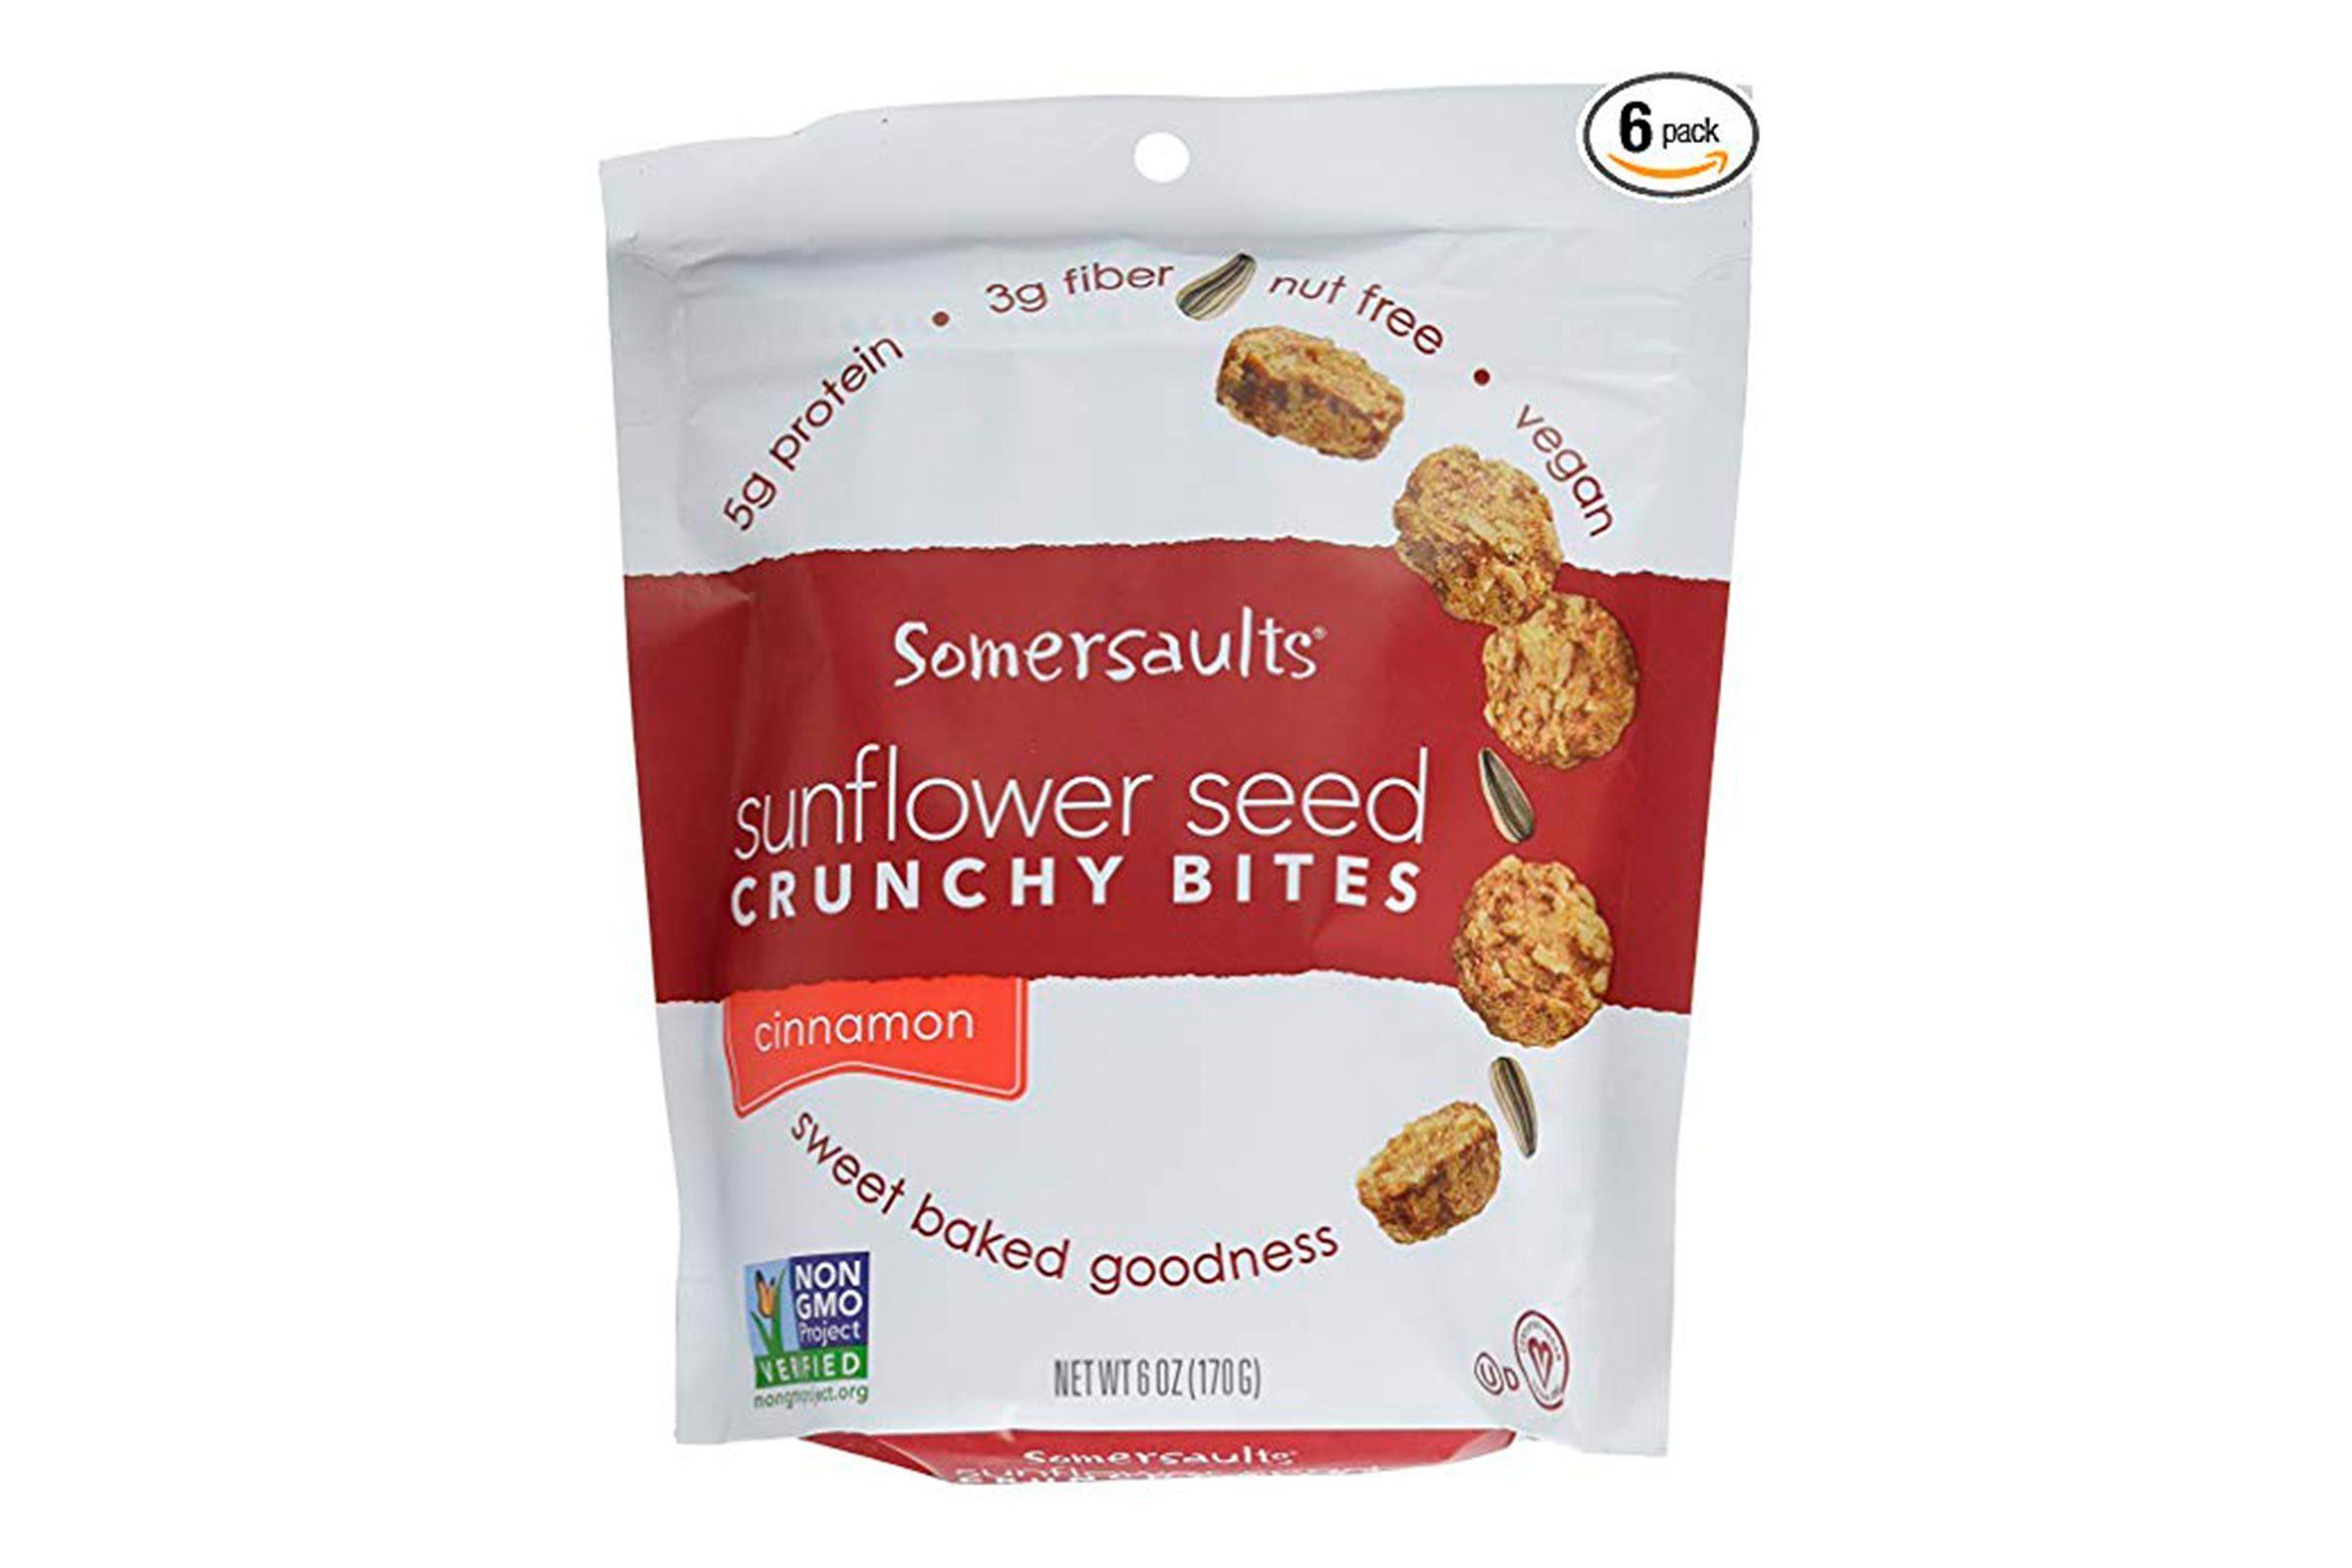 Somersaults Sunflower Seed Bites